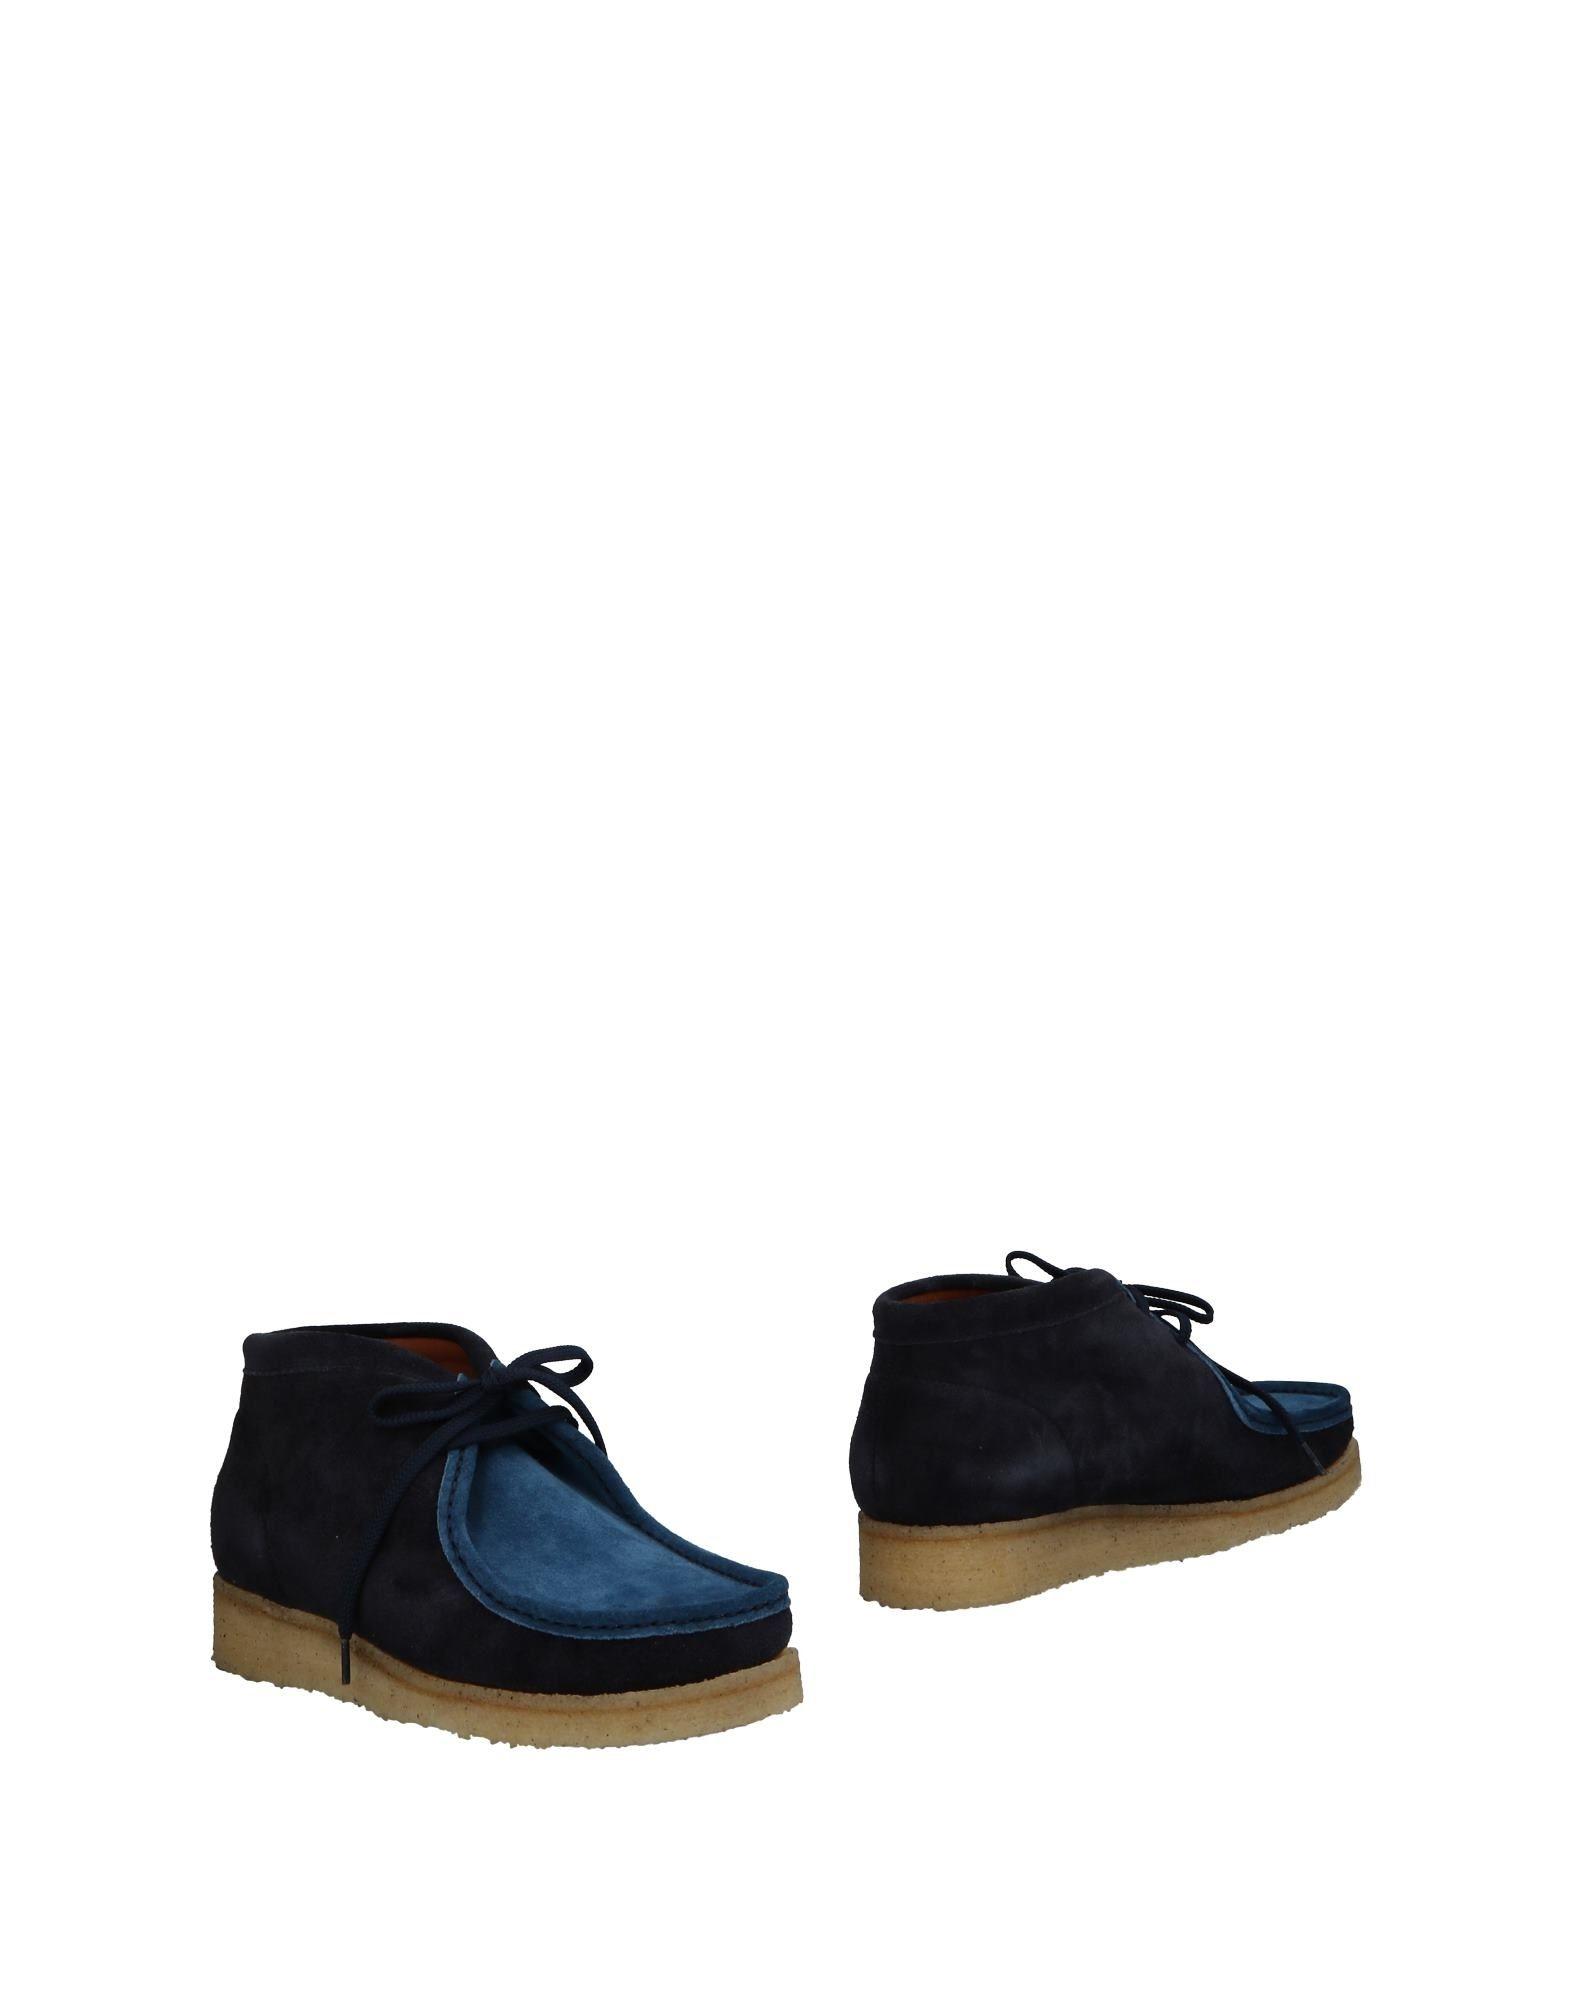 Gut Barnes um billige Schuhe zu tragenPadmore & Barnes Gut Stiefelette Damen  11496716JQ 76136e